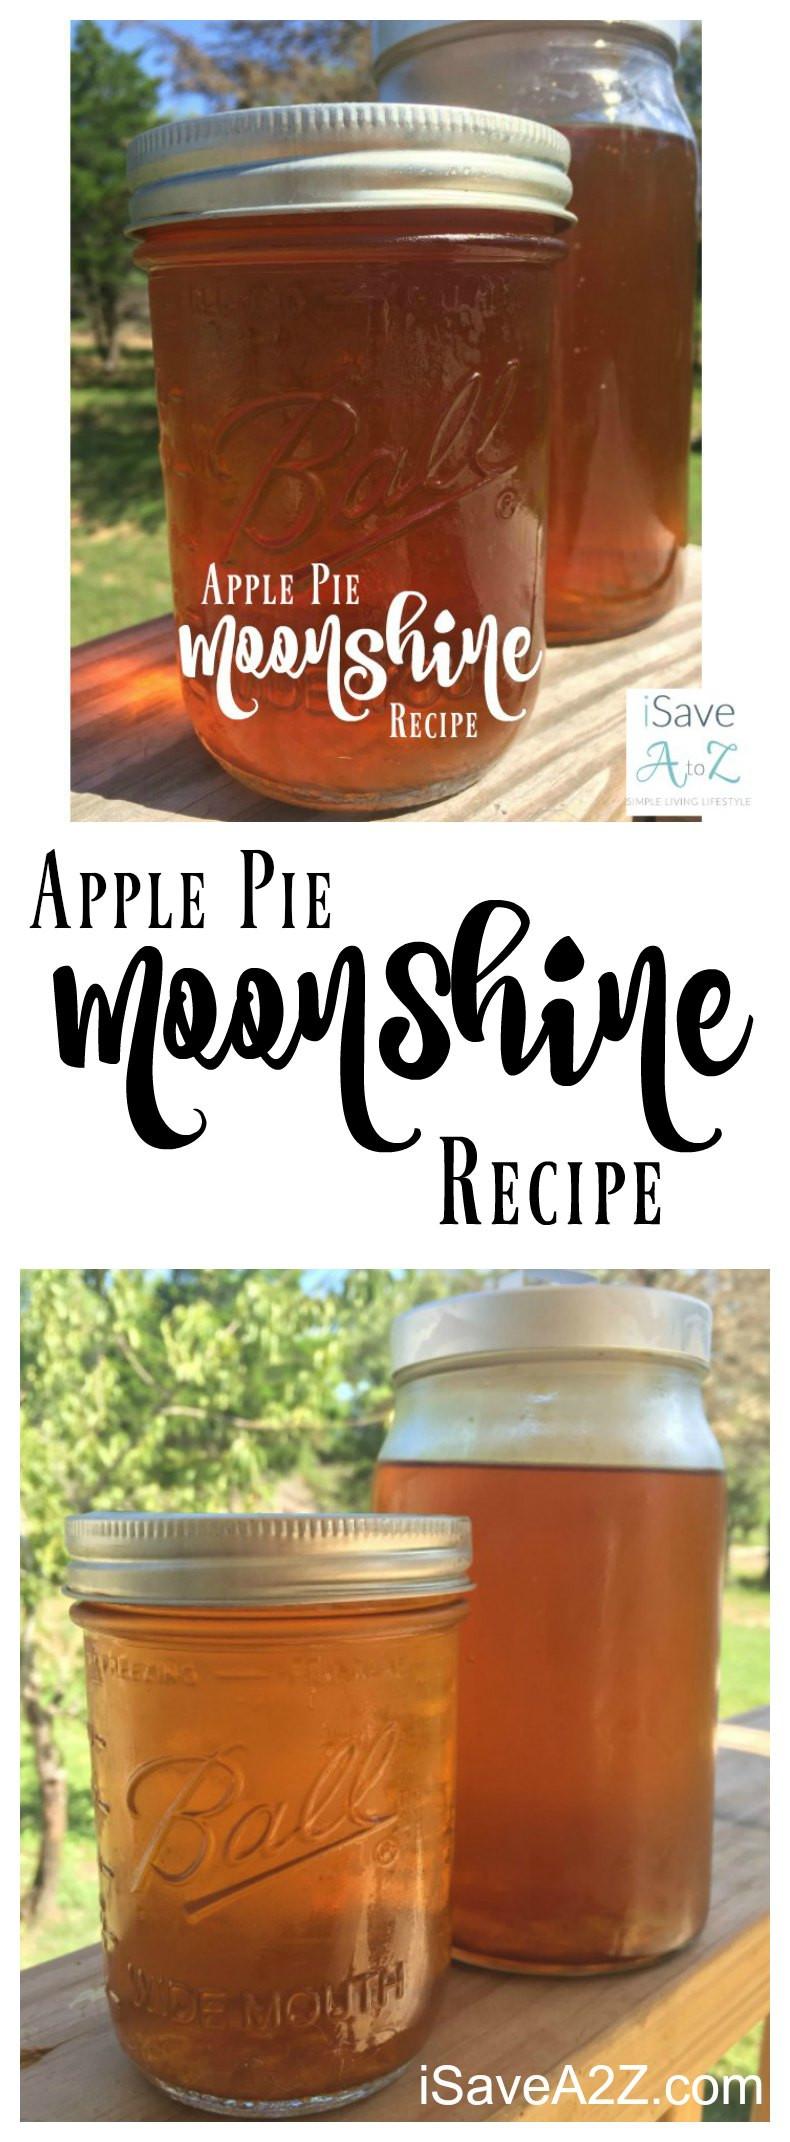 Apple Pie Moonshine Recipe  Apple Pie Moonshine Recipe iSaveA2Z